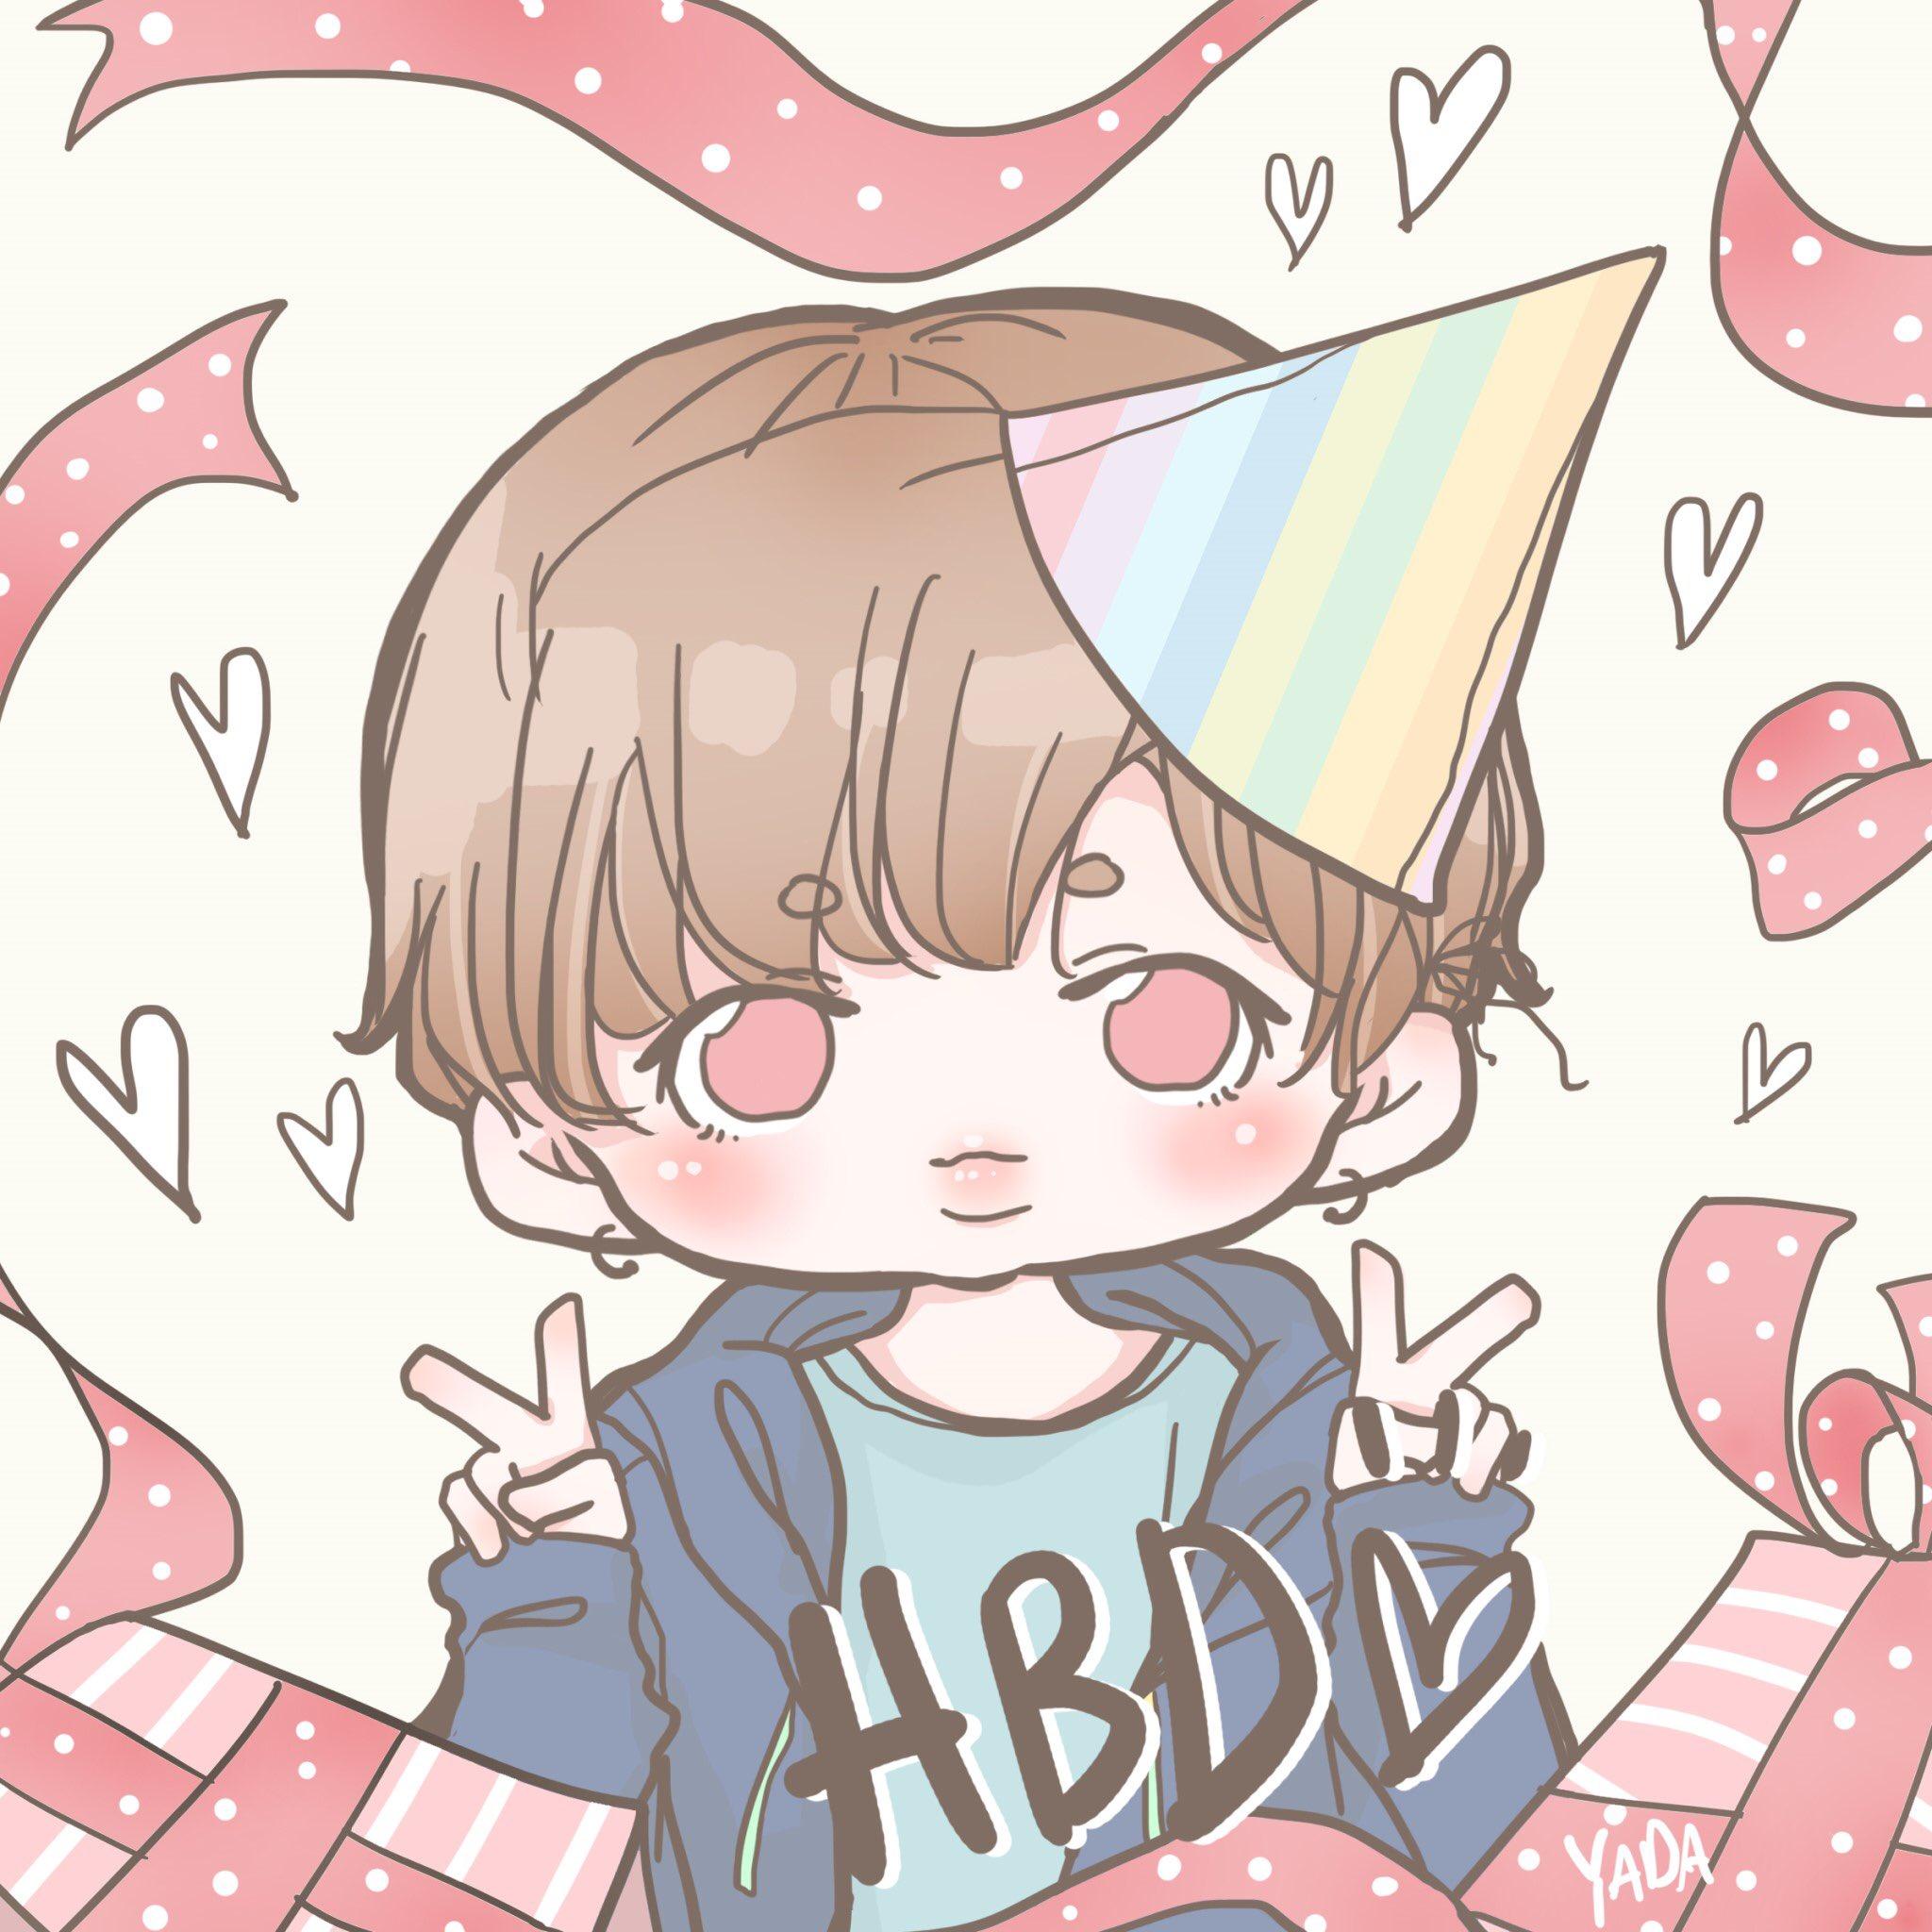 HAPPY BIRTHDAY mr. strawberry prince